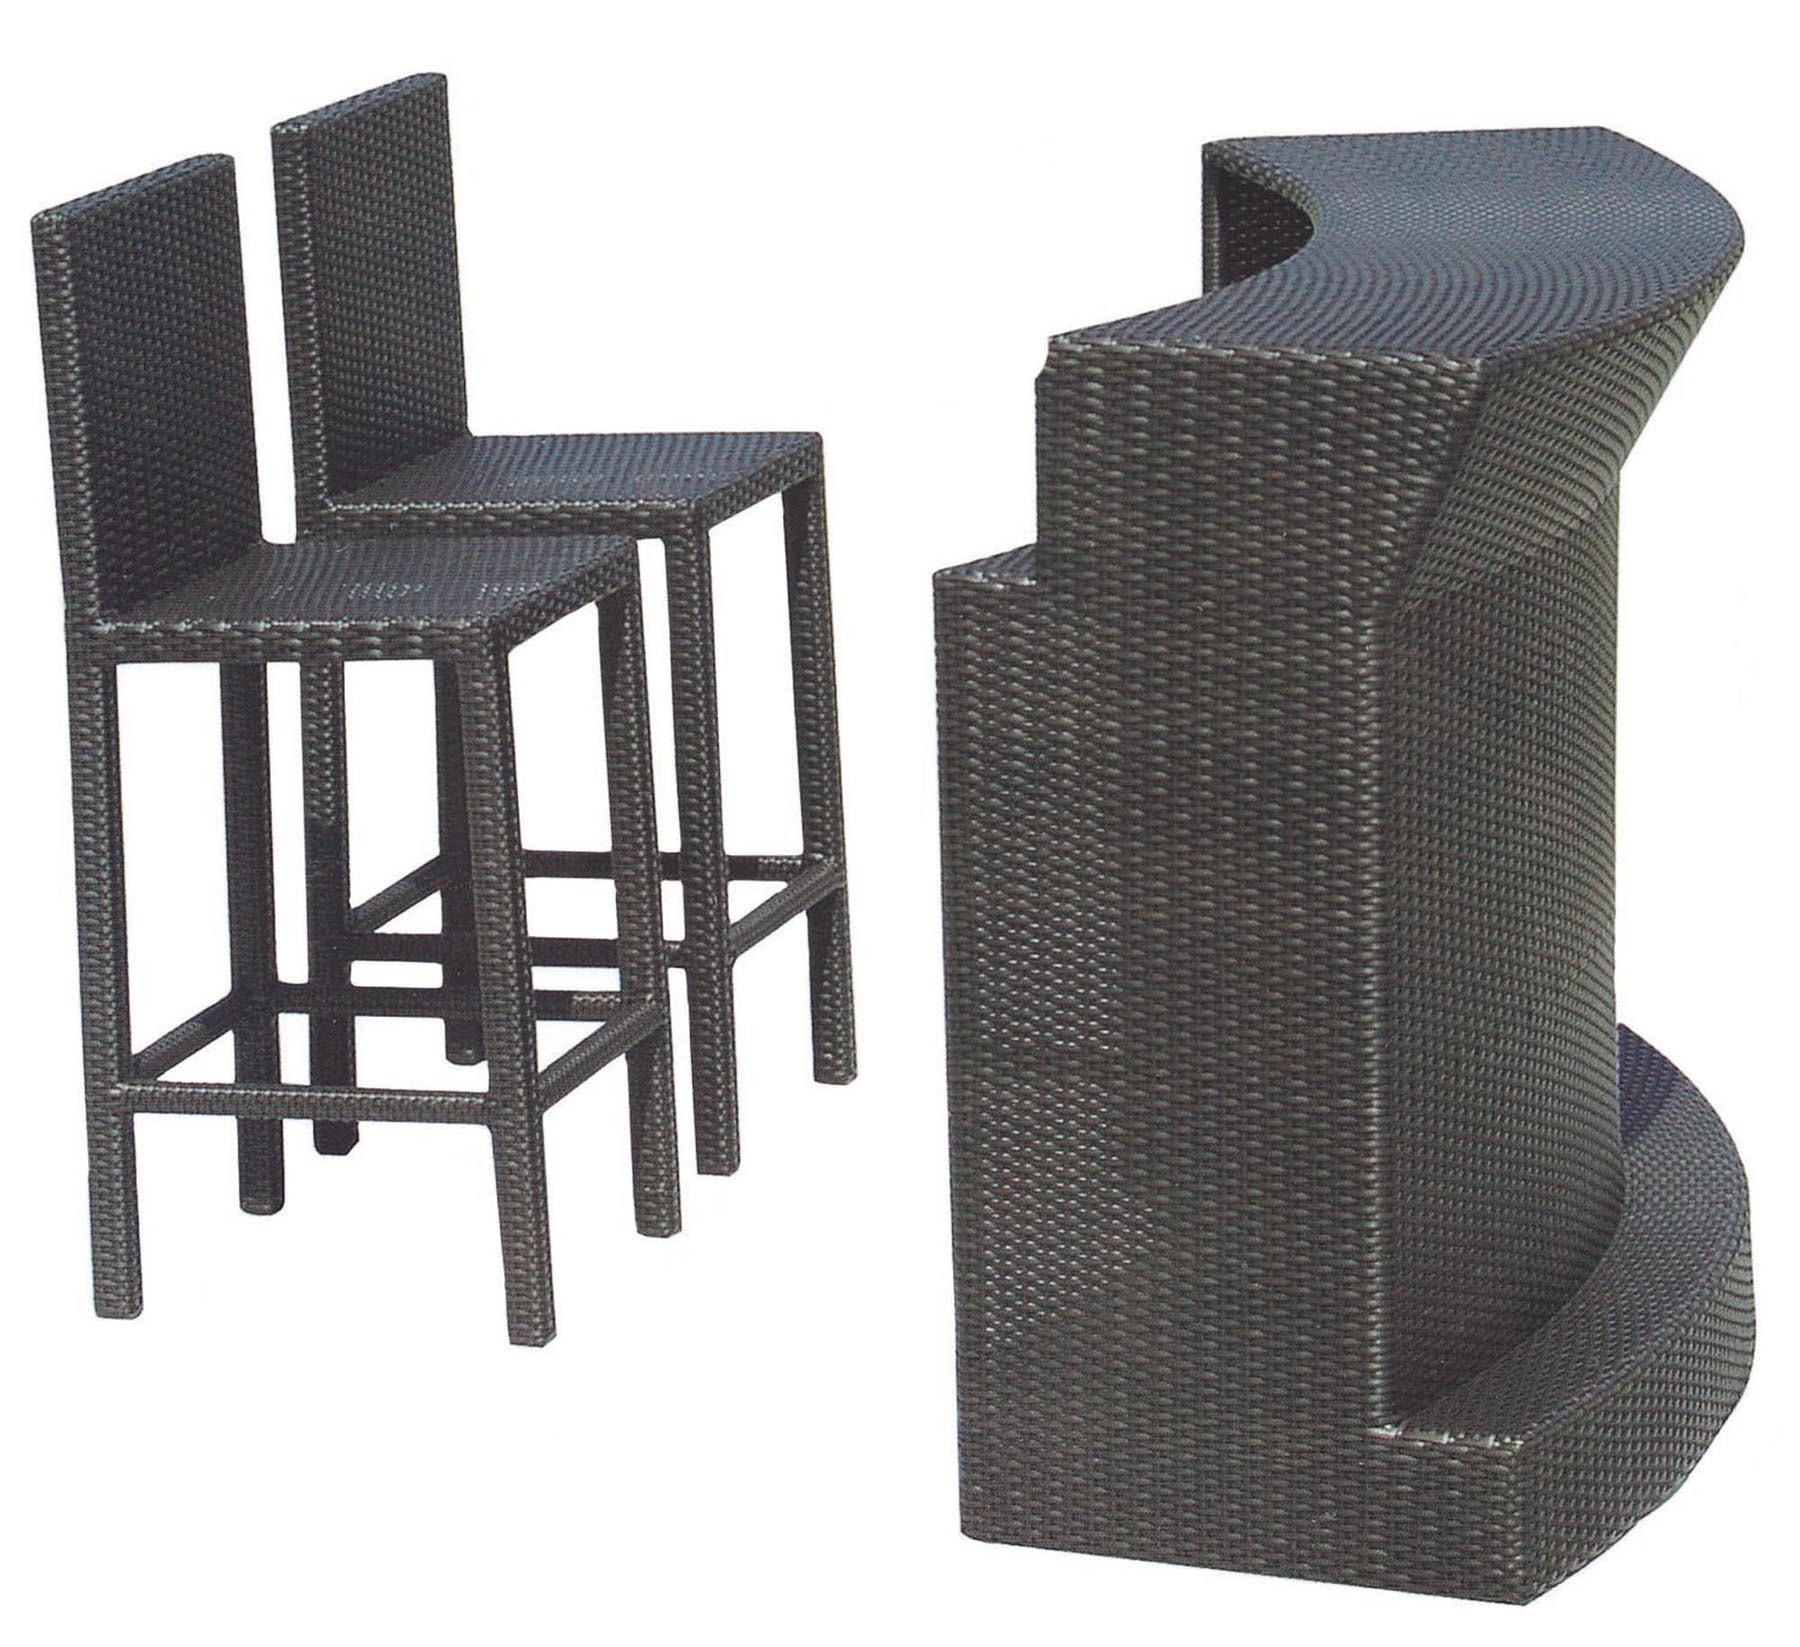 Muebles de la barra (YH3013) – Muebles de la barra (YH3013